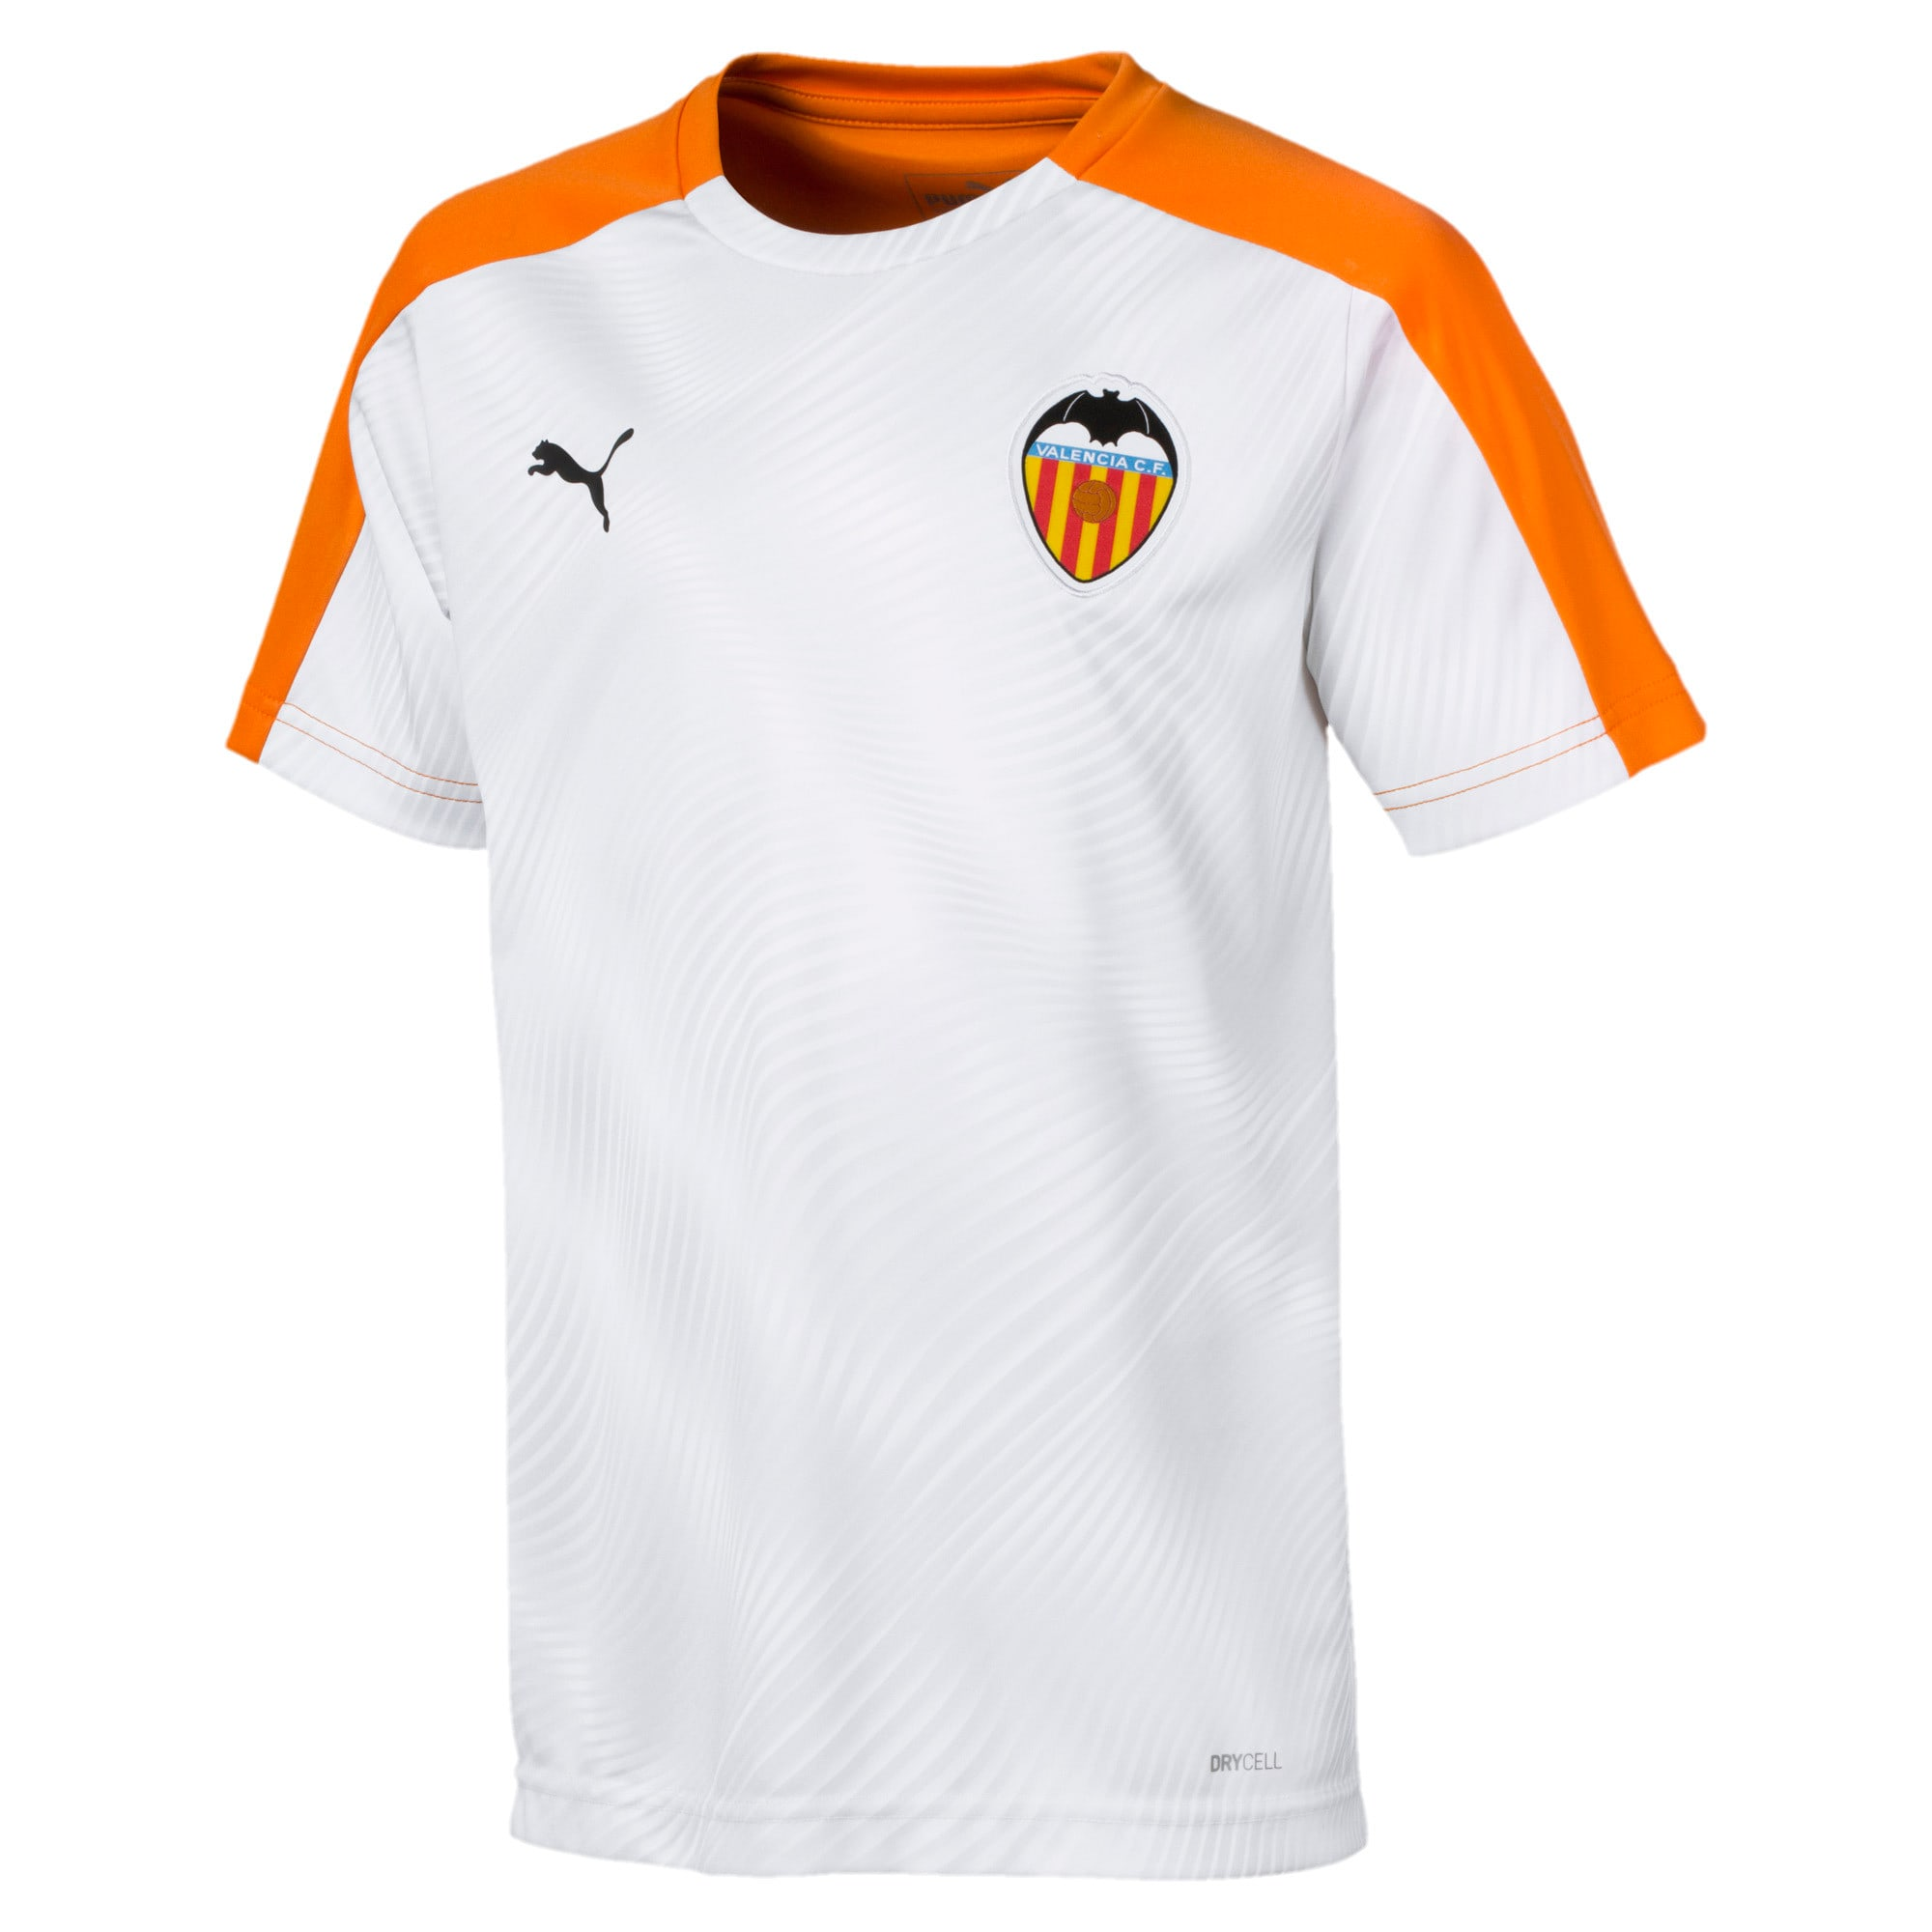 Thumbnail 1 of Valencia CF Kids' Stadium Jersey, Vibrant Orange-Puma White, medium